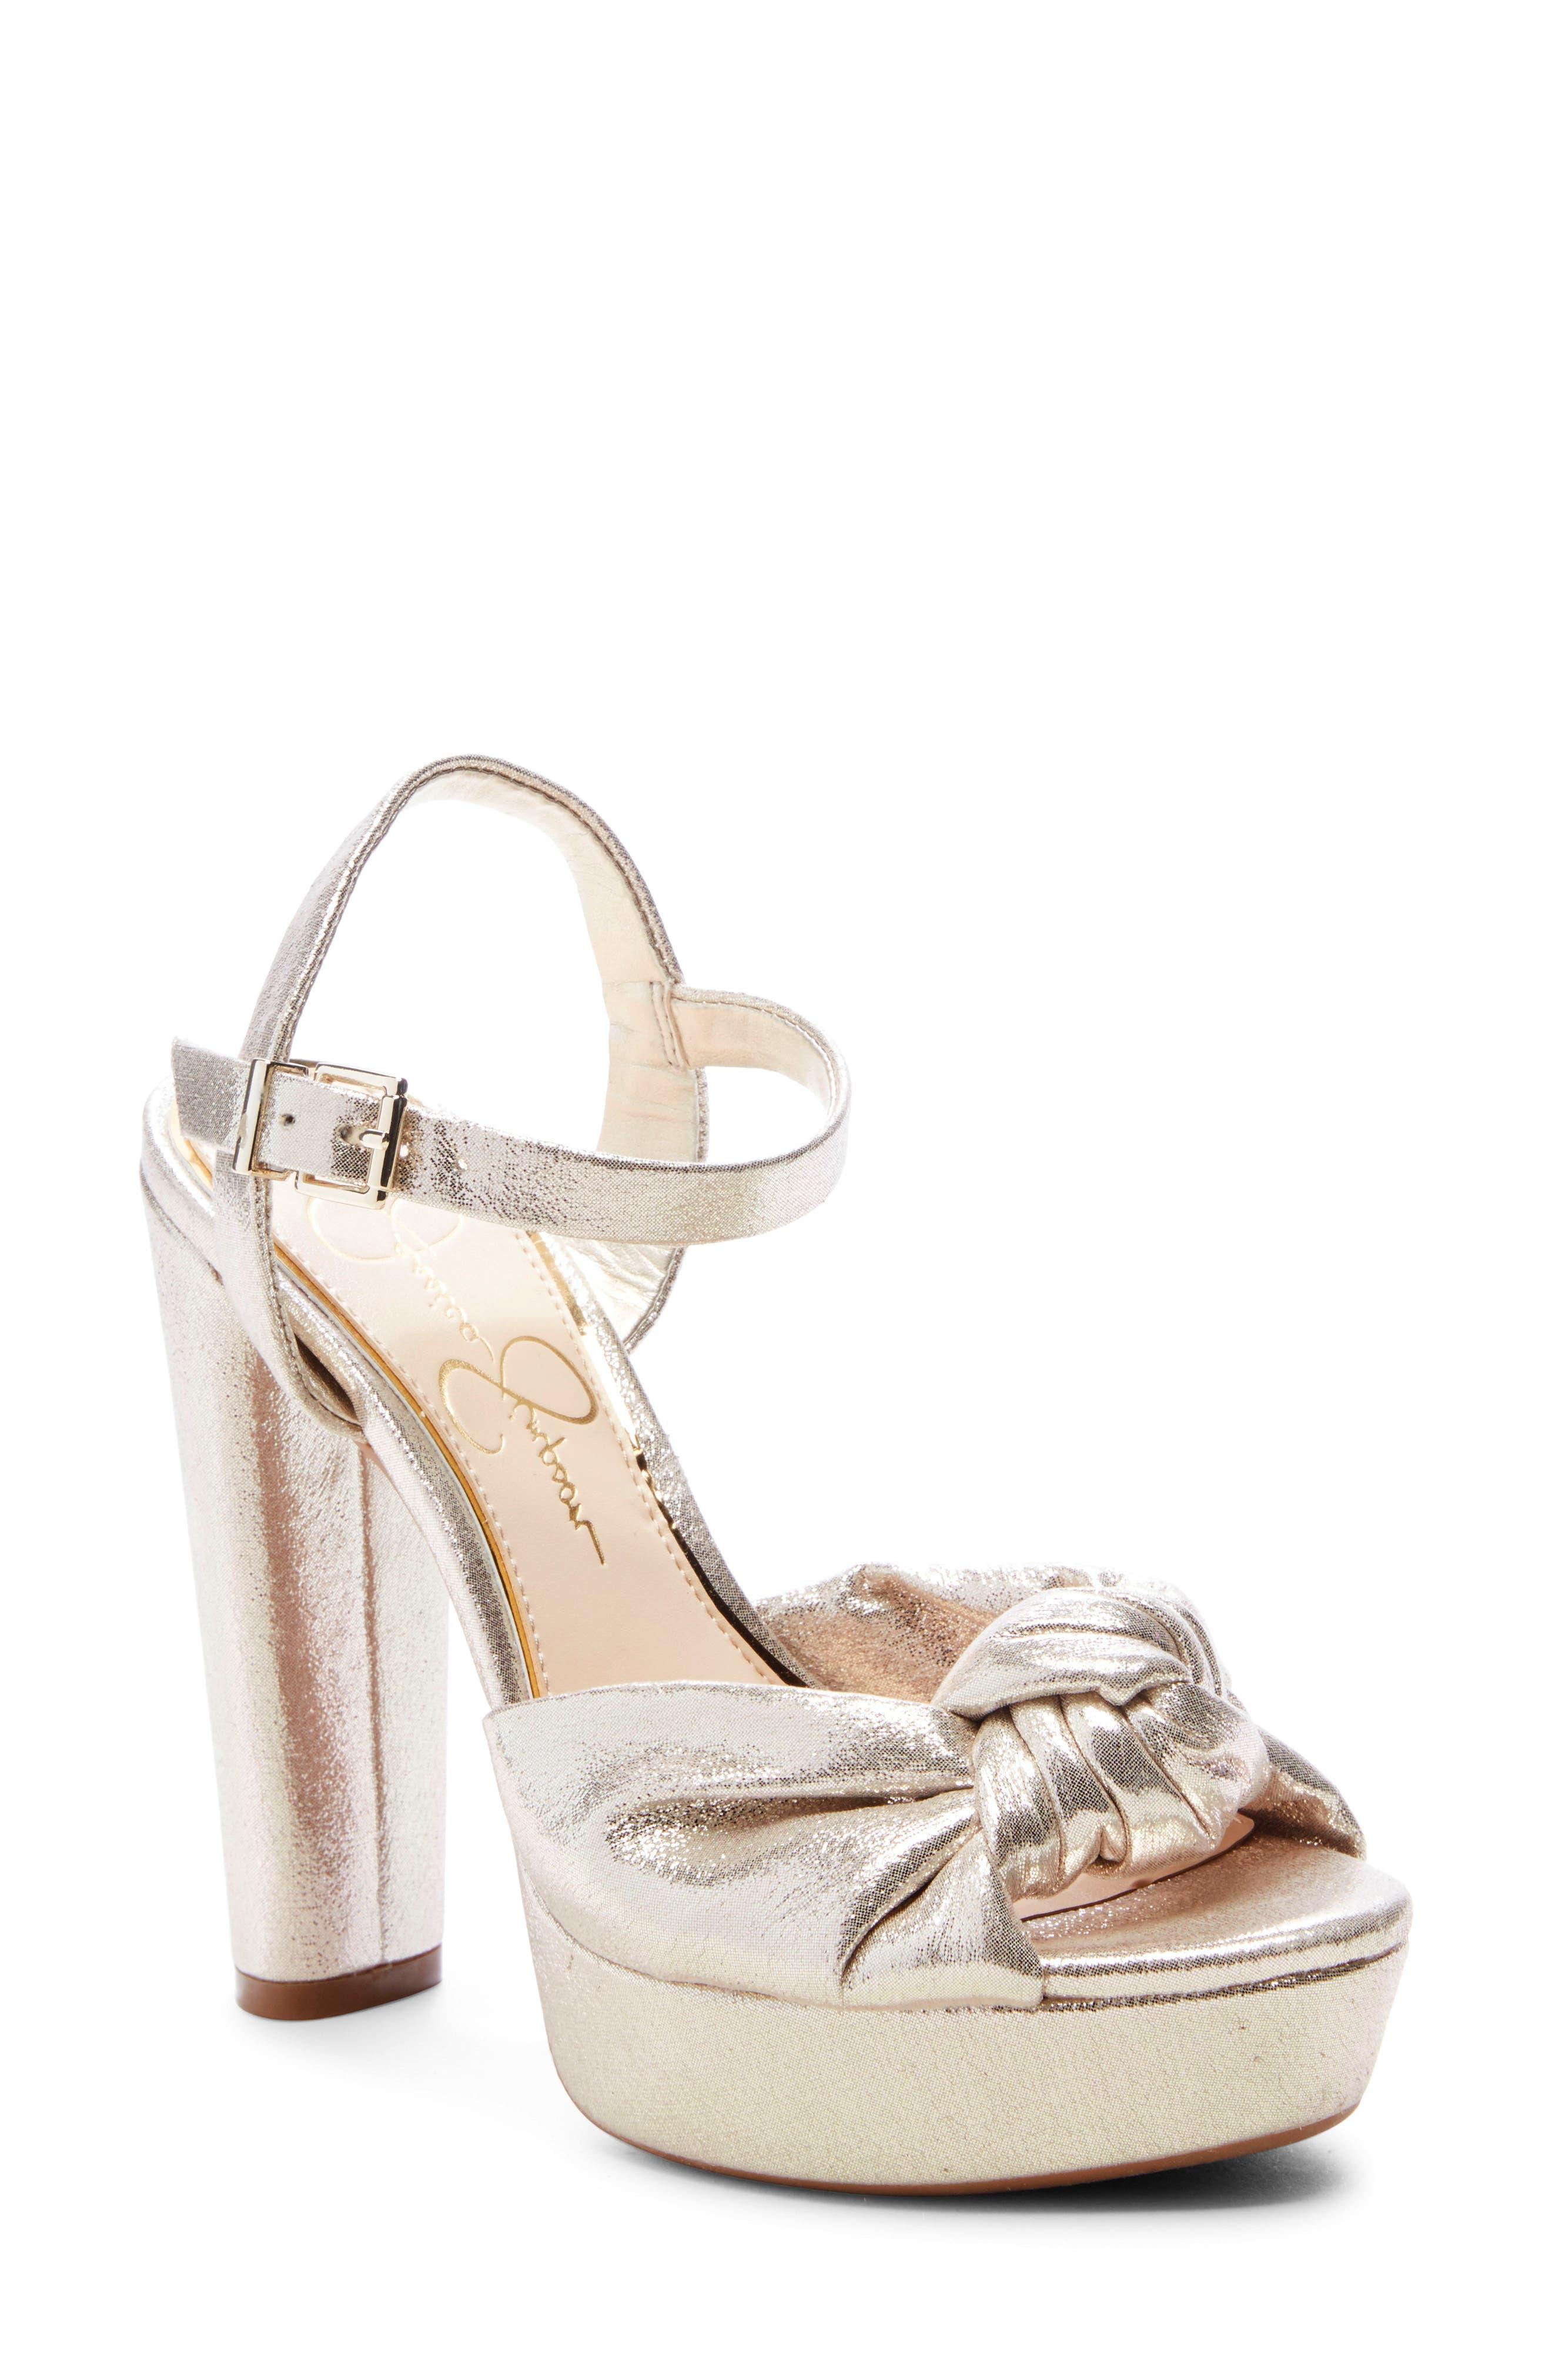 Jessica Simpson Ivrey Knot Platform Sandal- Metallic